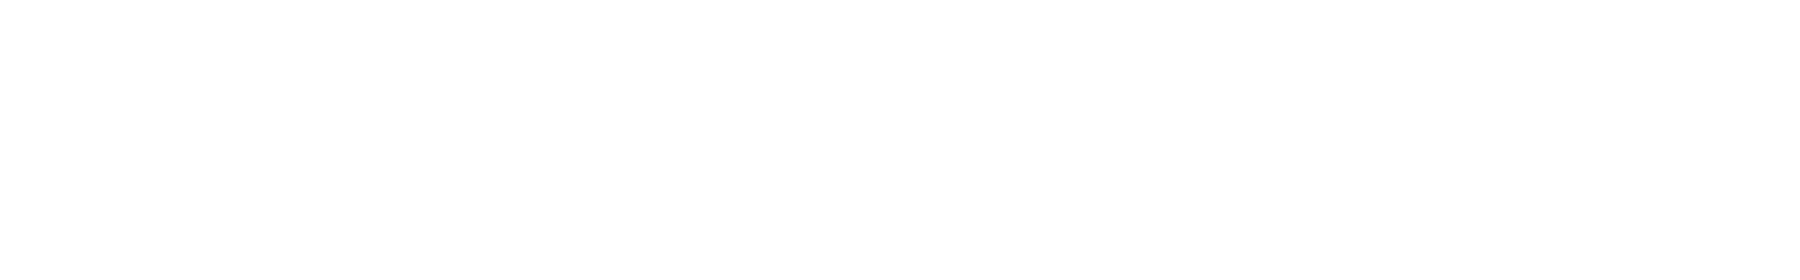 blbc cinedrumsb 95 01